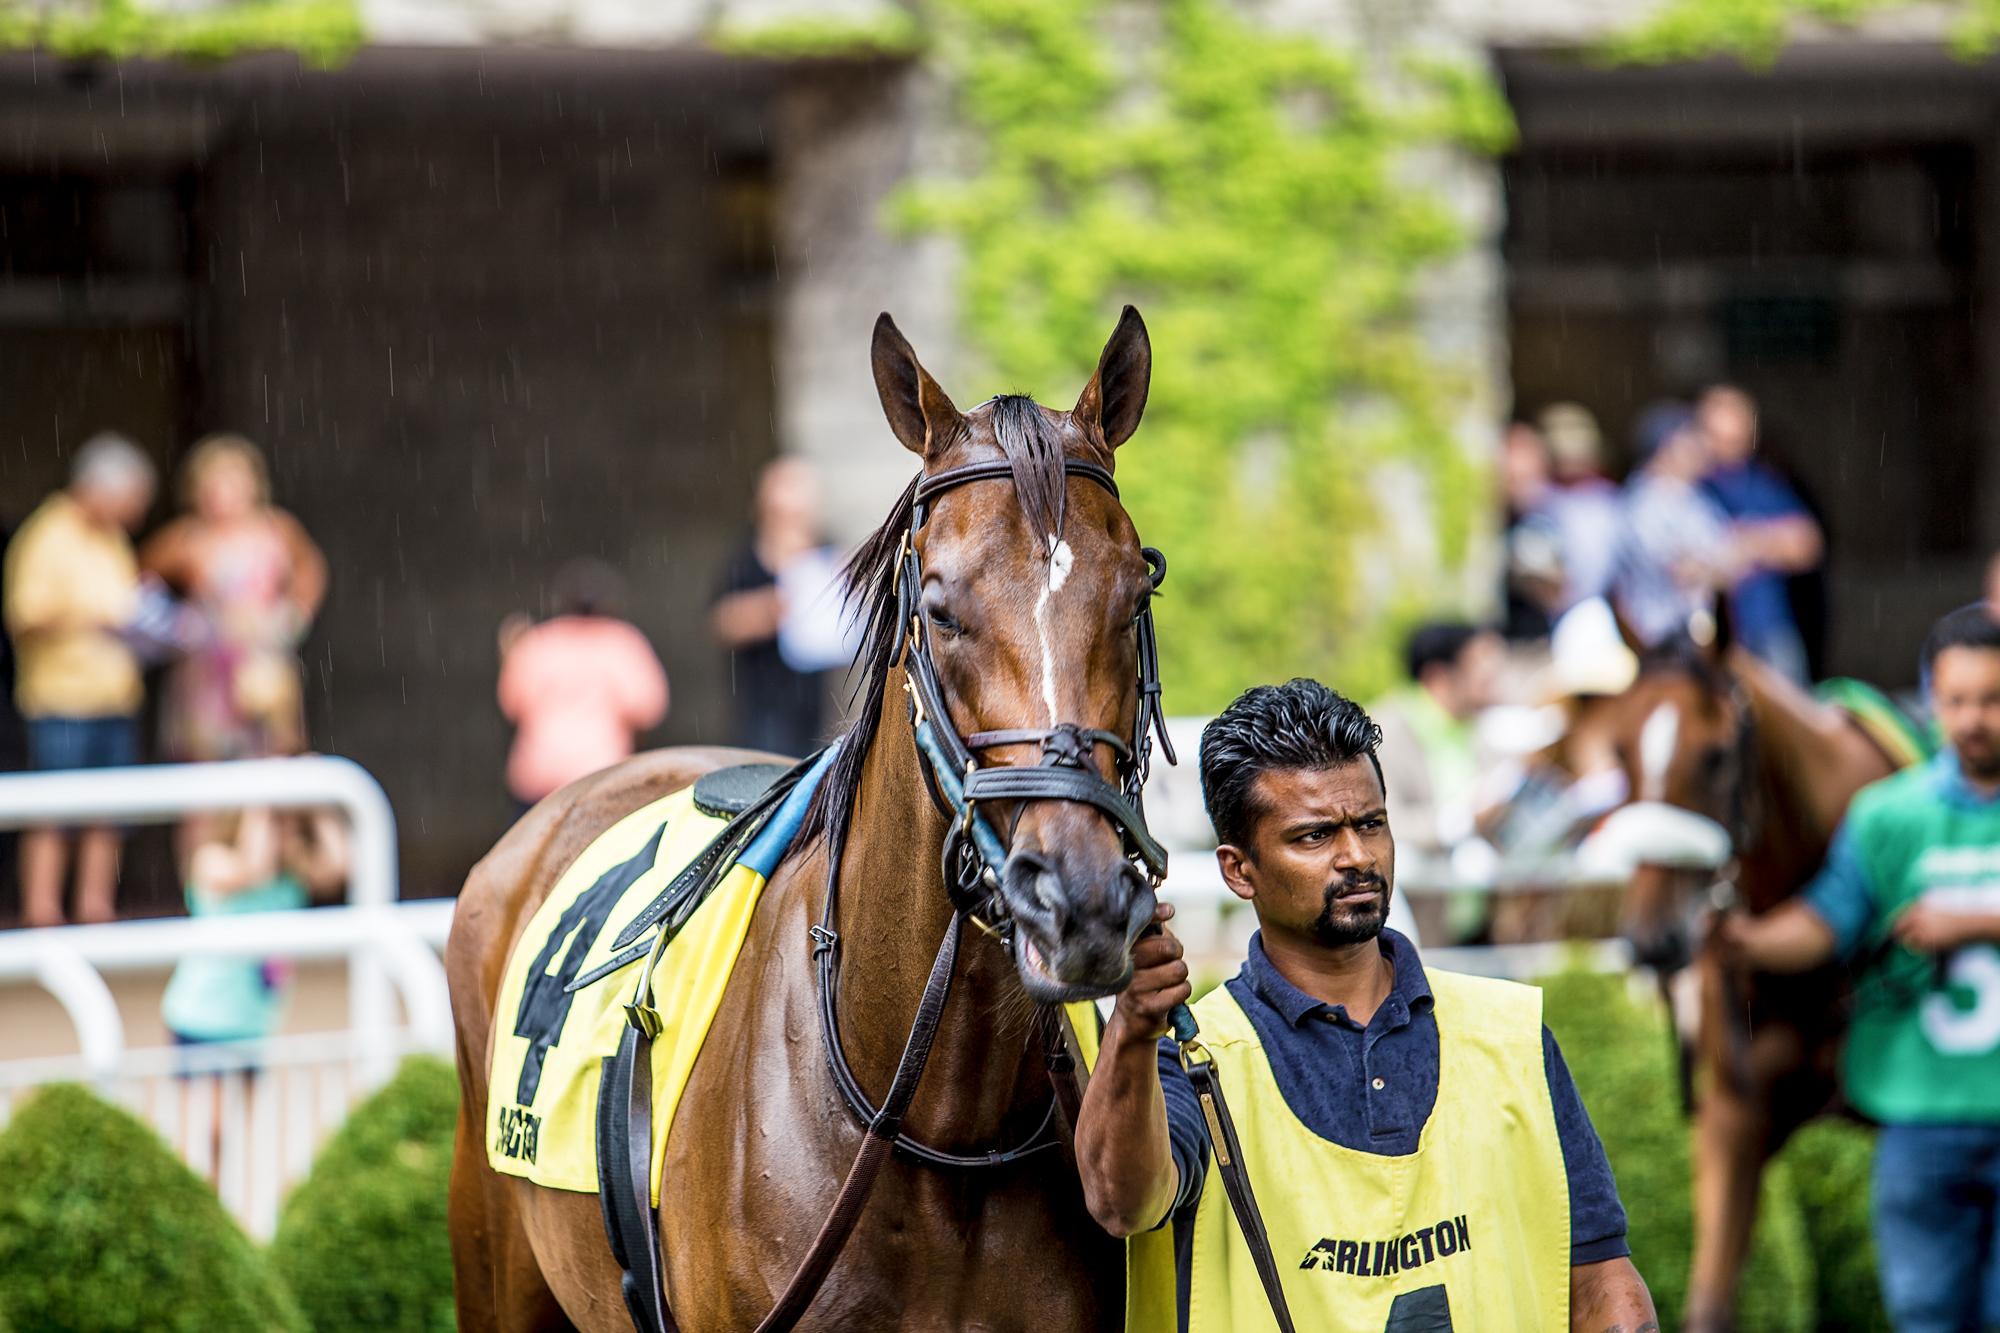 Race_Horses_467_2000x2000.jpg